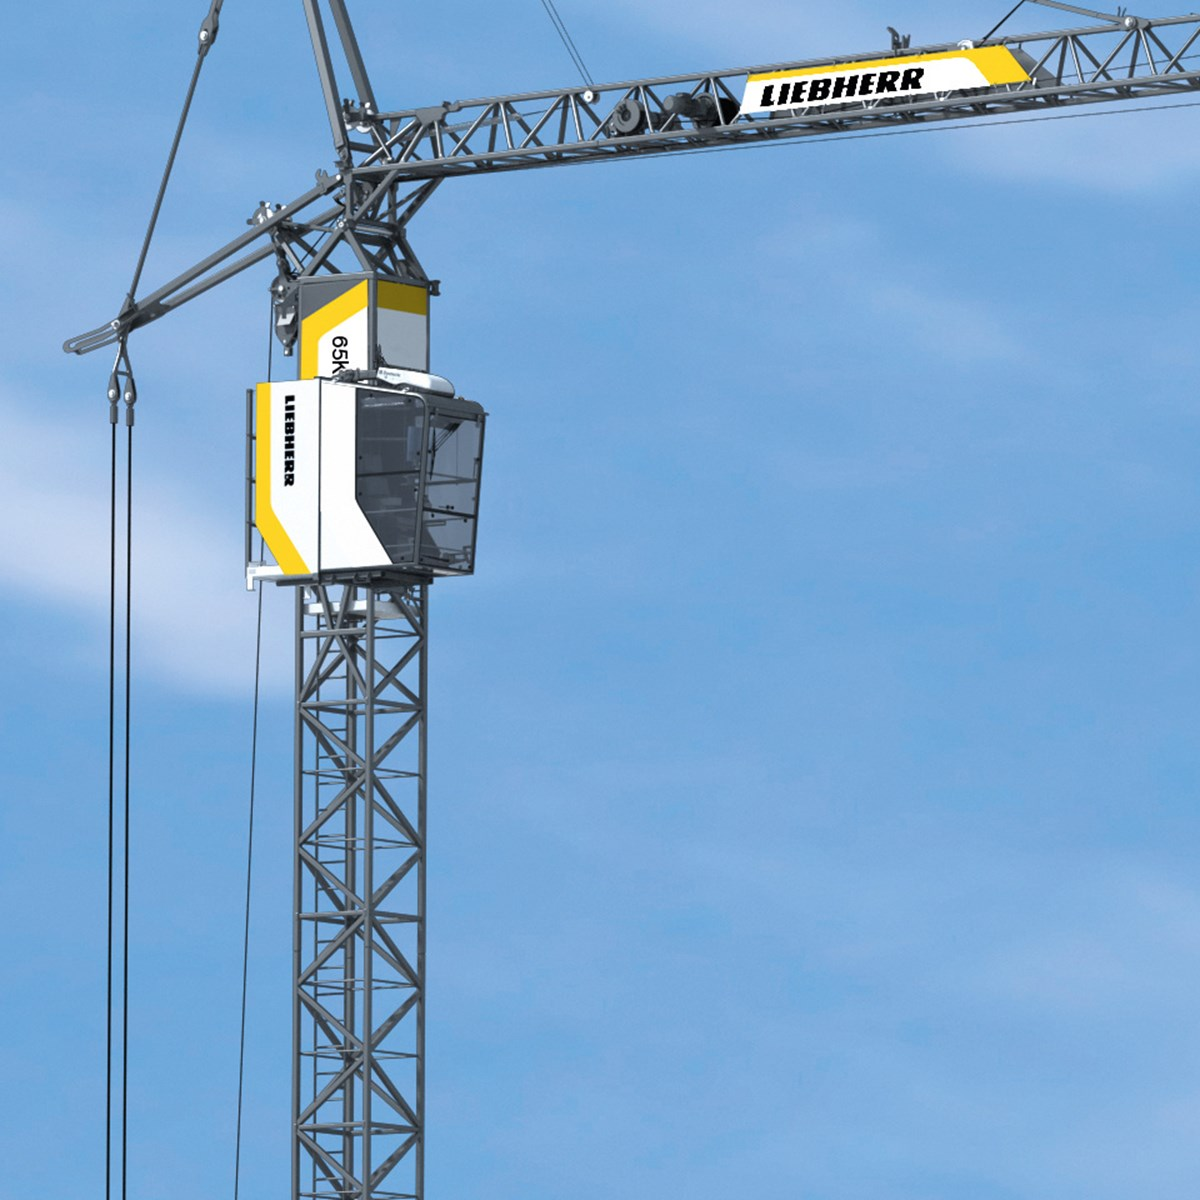 liebherr-65k-1-fast-erecting-crane-1.jpg